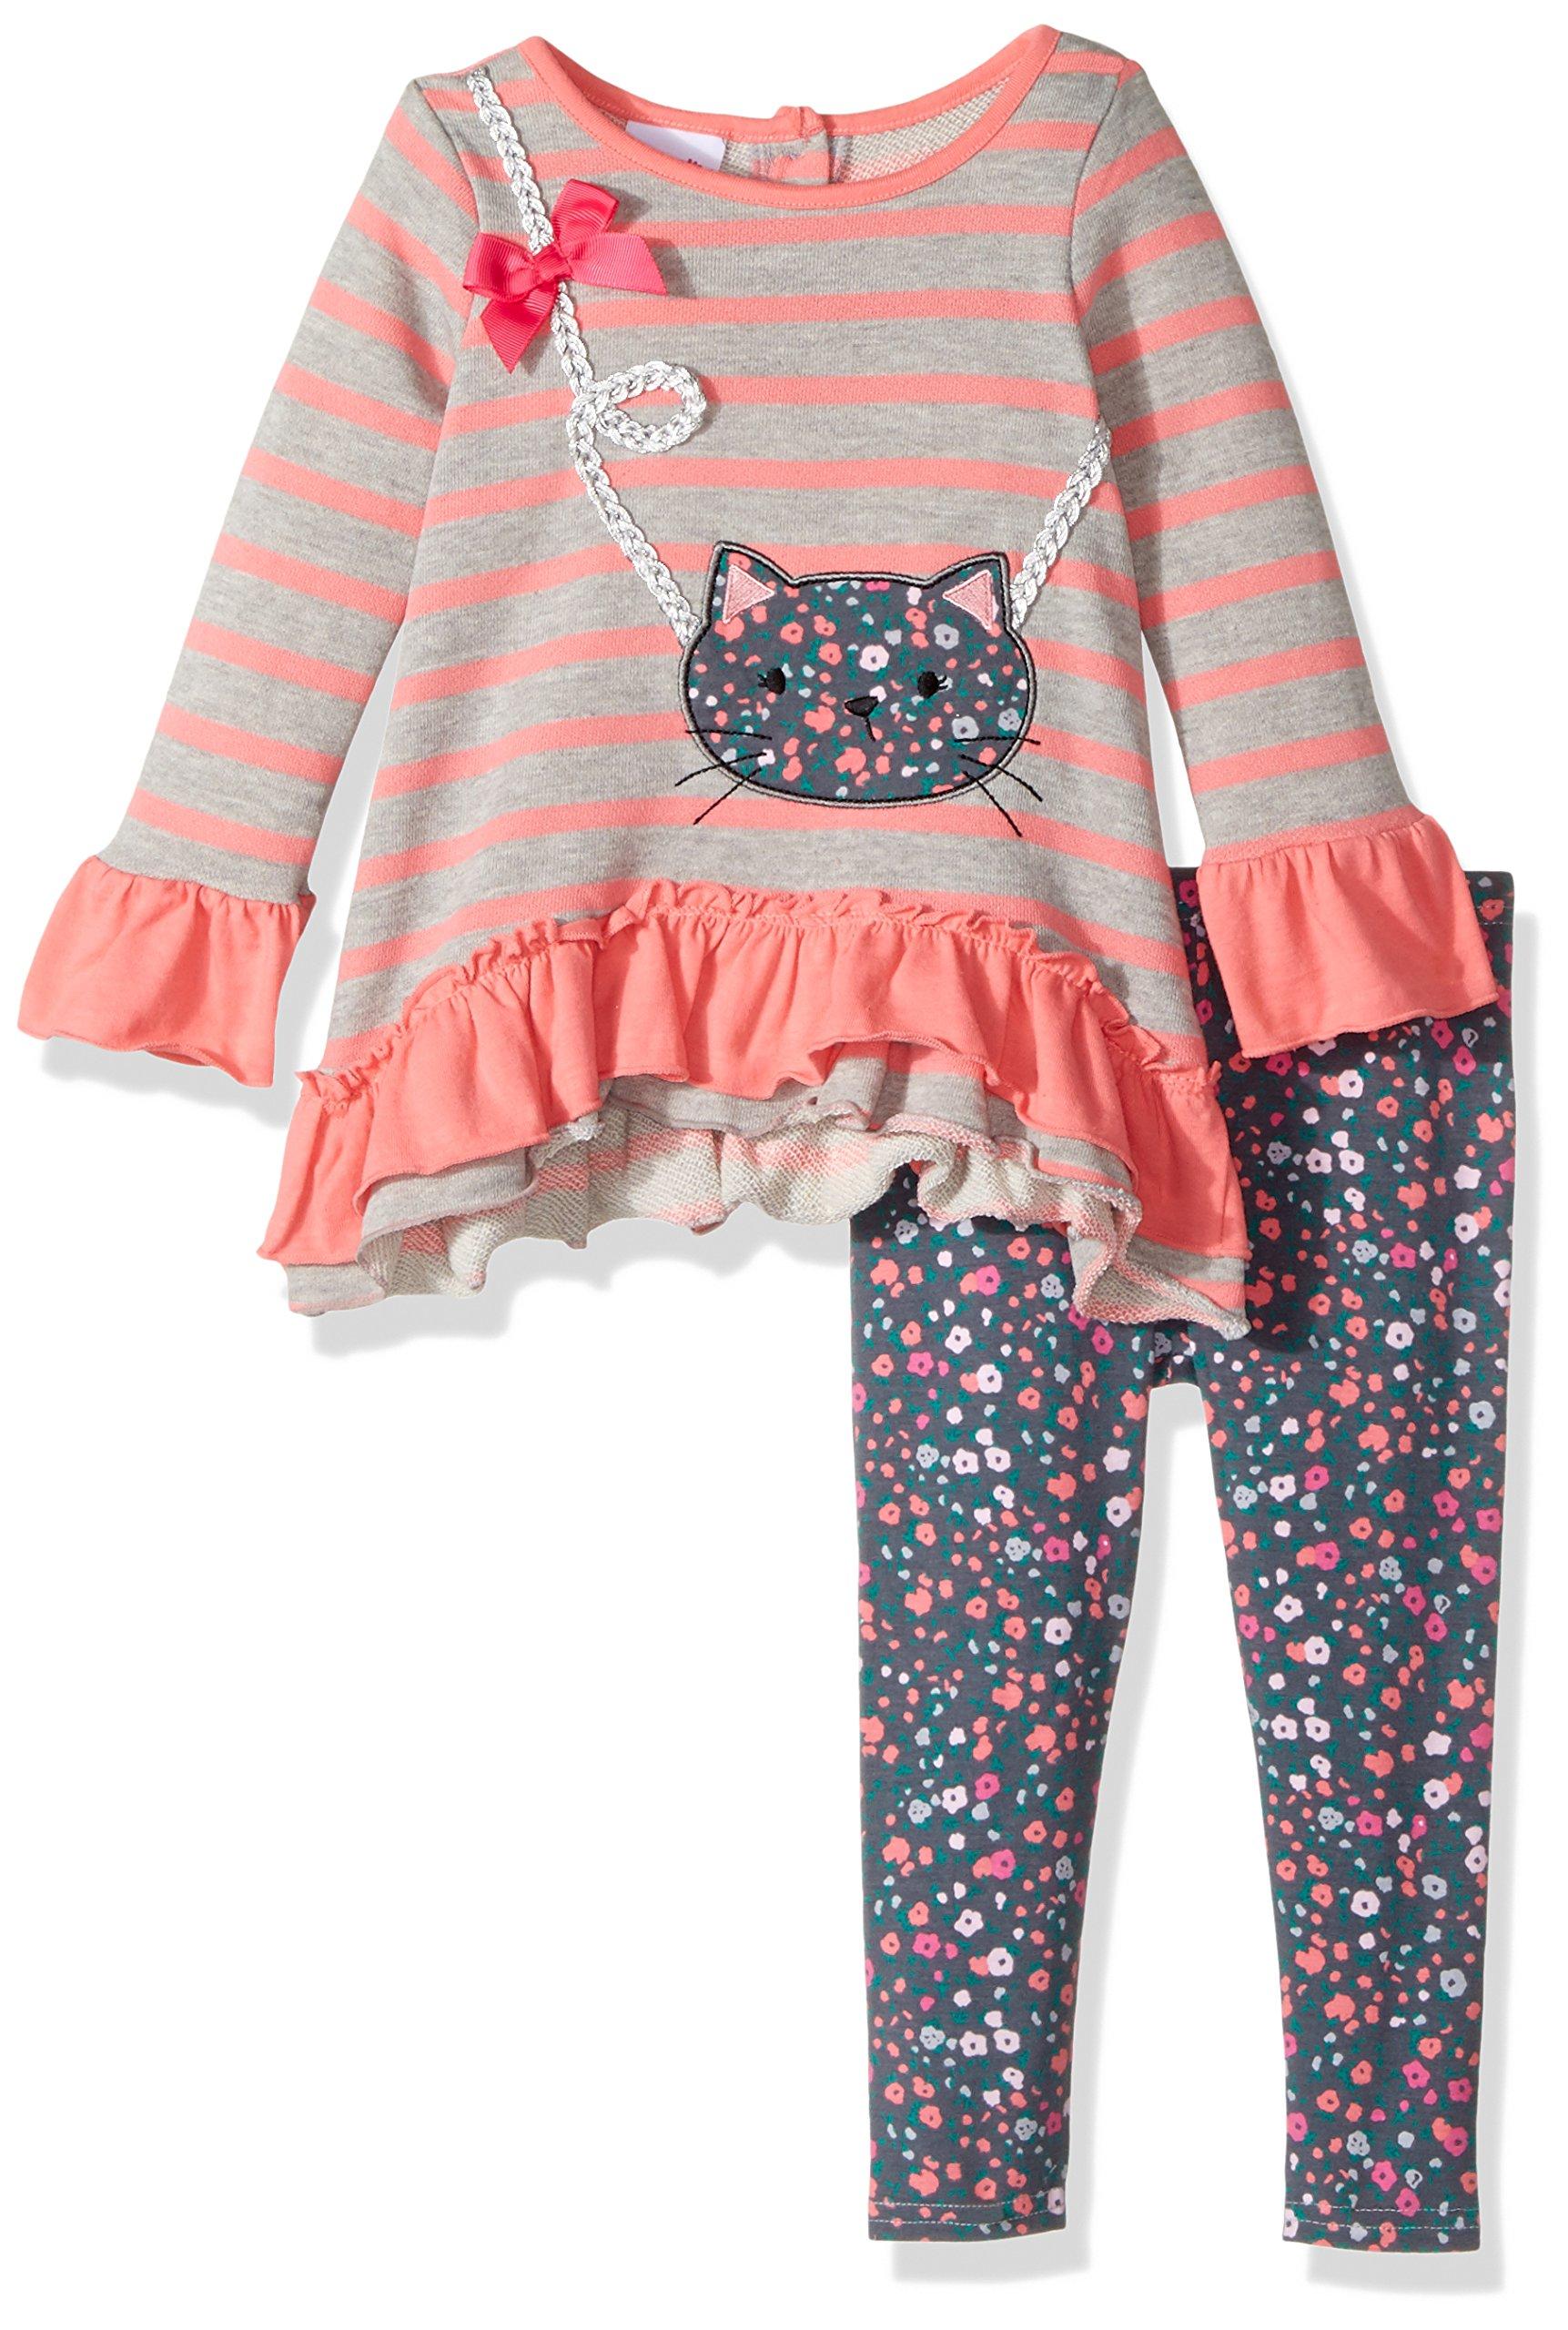 Nannette Baby Girls' Playwear Long Sleeve Top and Legging Set, Grey, 24m